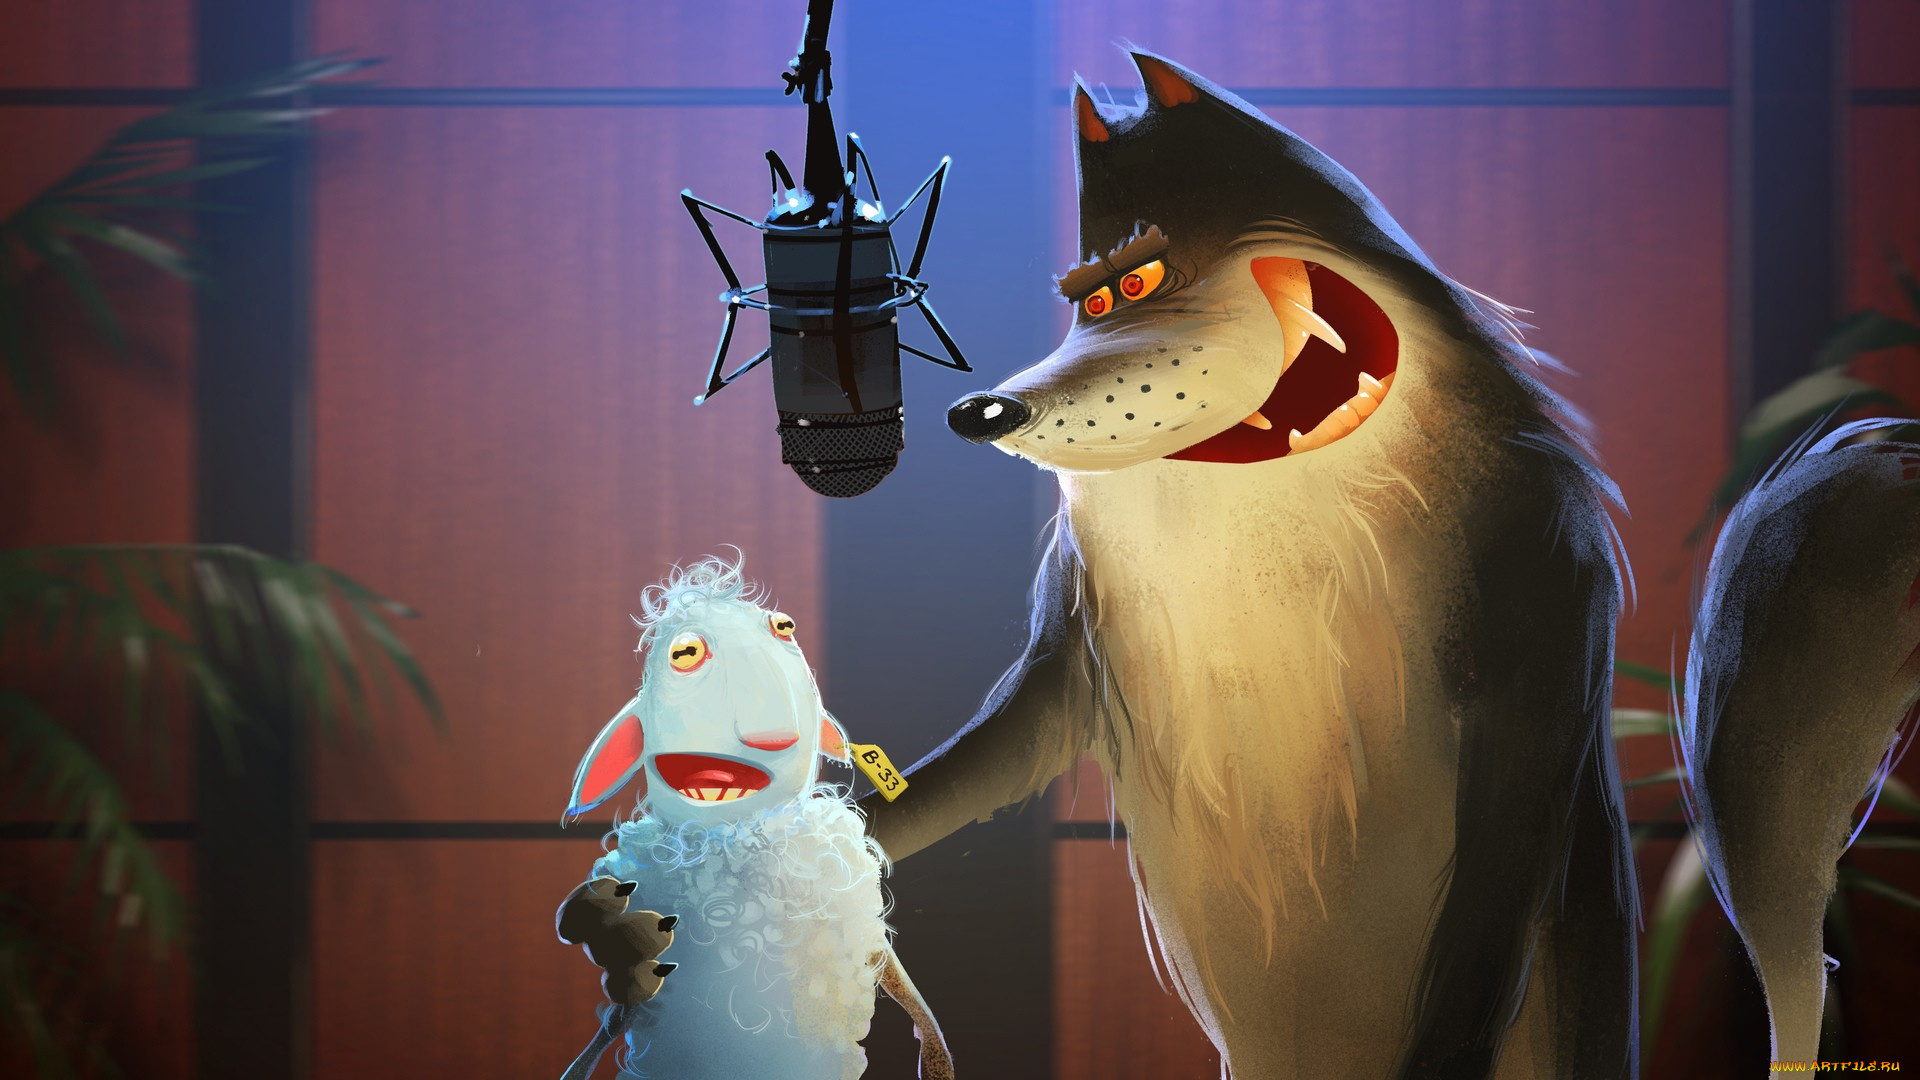 General 1920x1080 humor sheep wolf artwork microphone